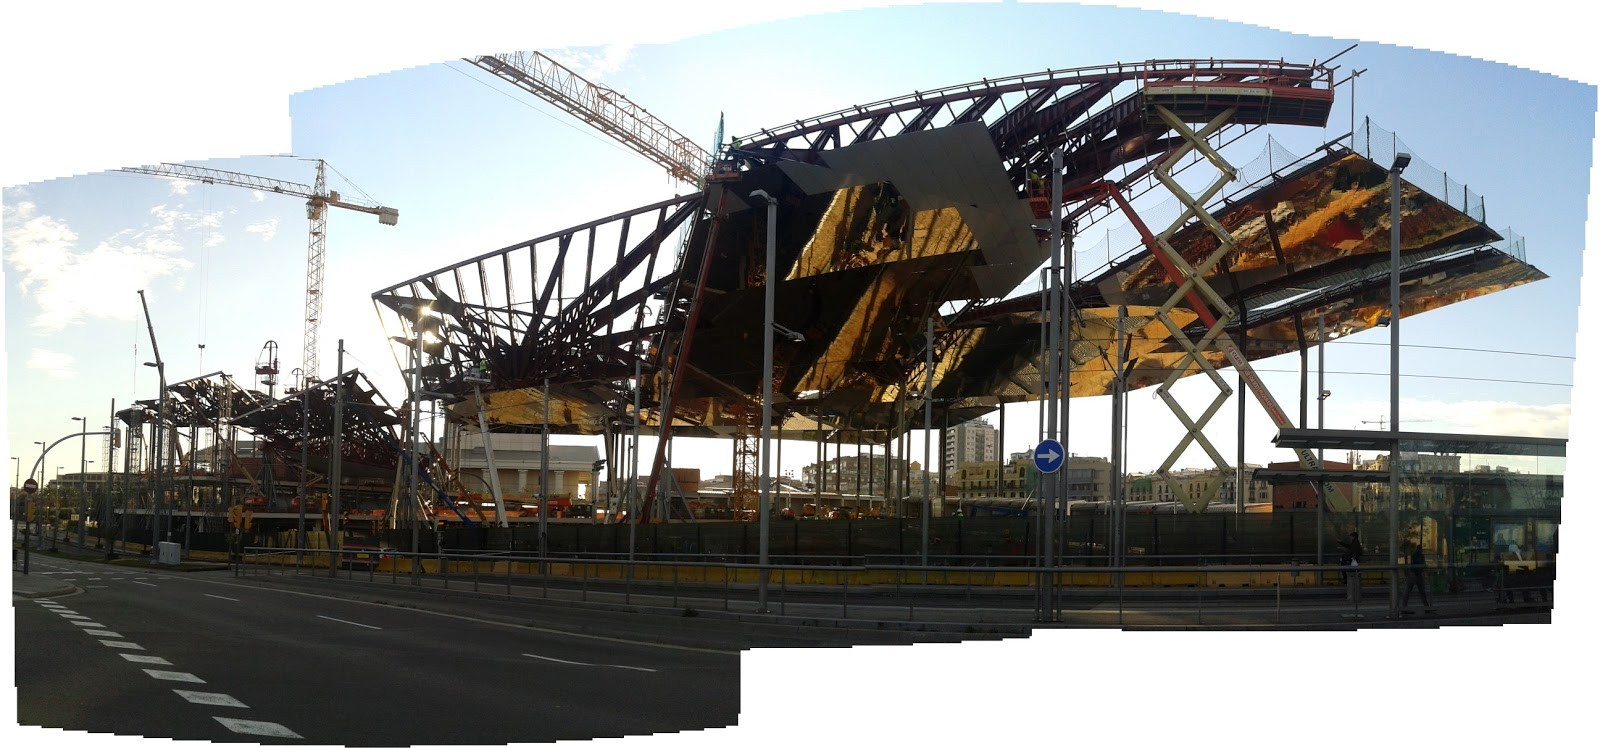 Construction as spectacle mercat dels encants criticalista - Encantes barcelona ...